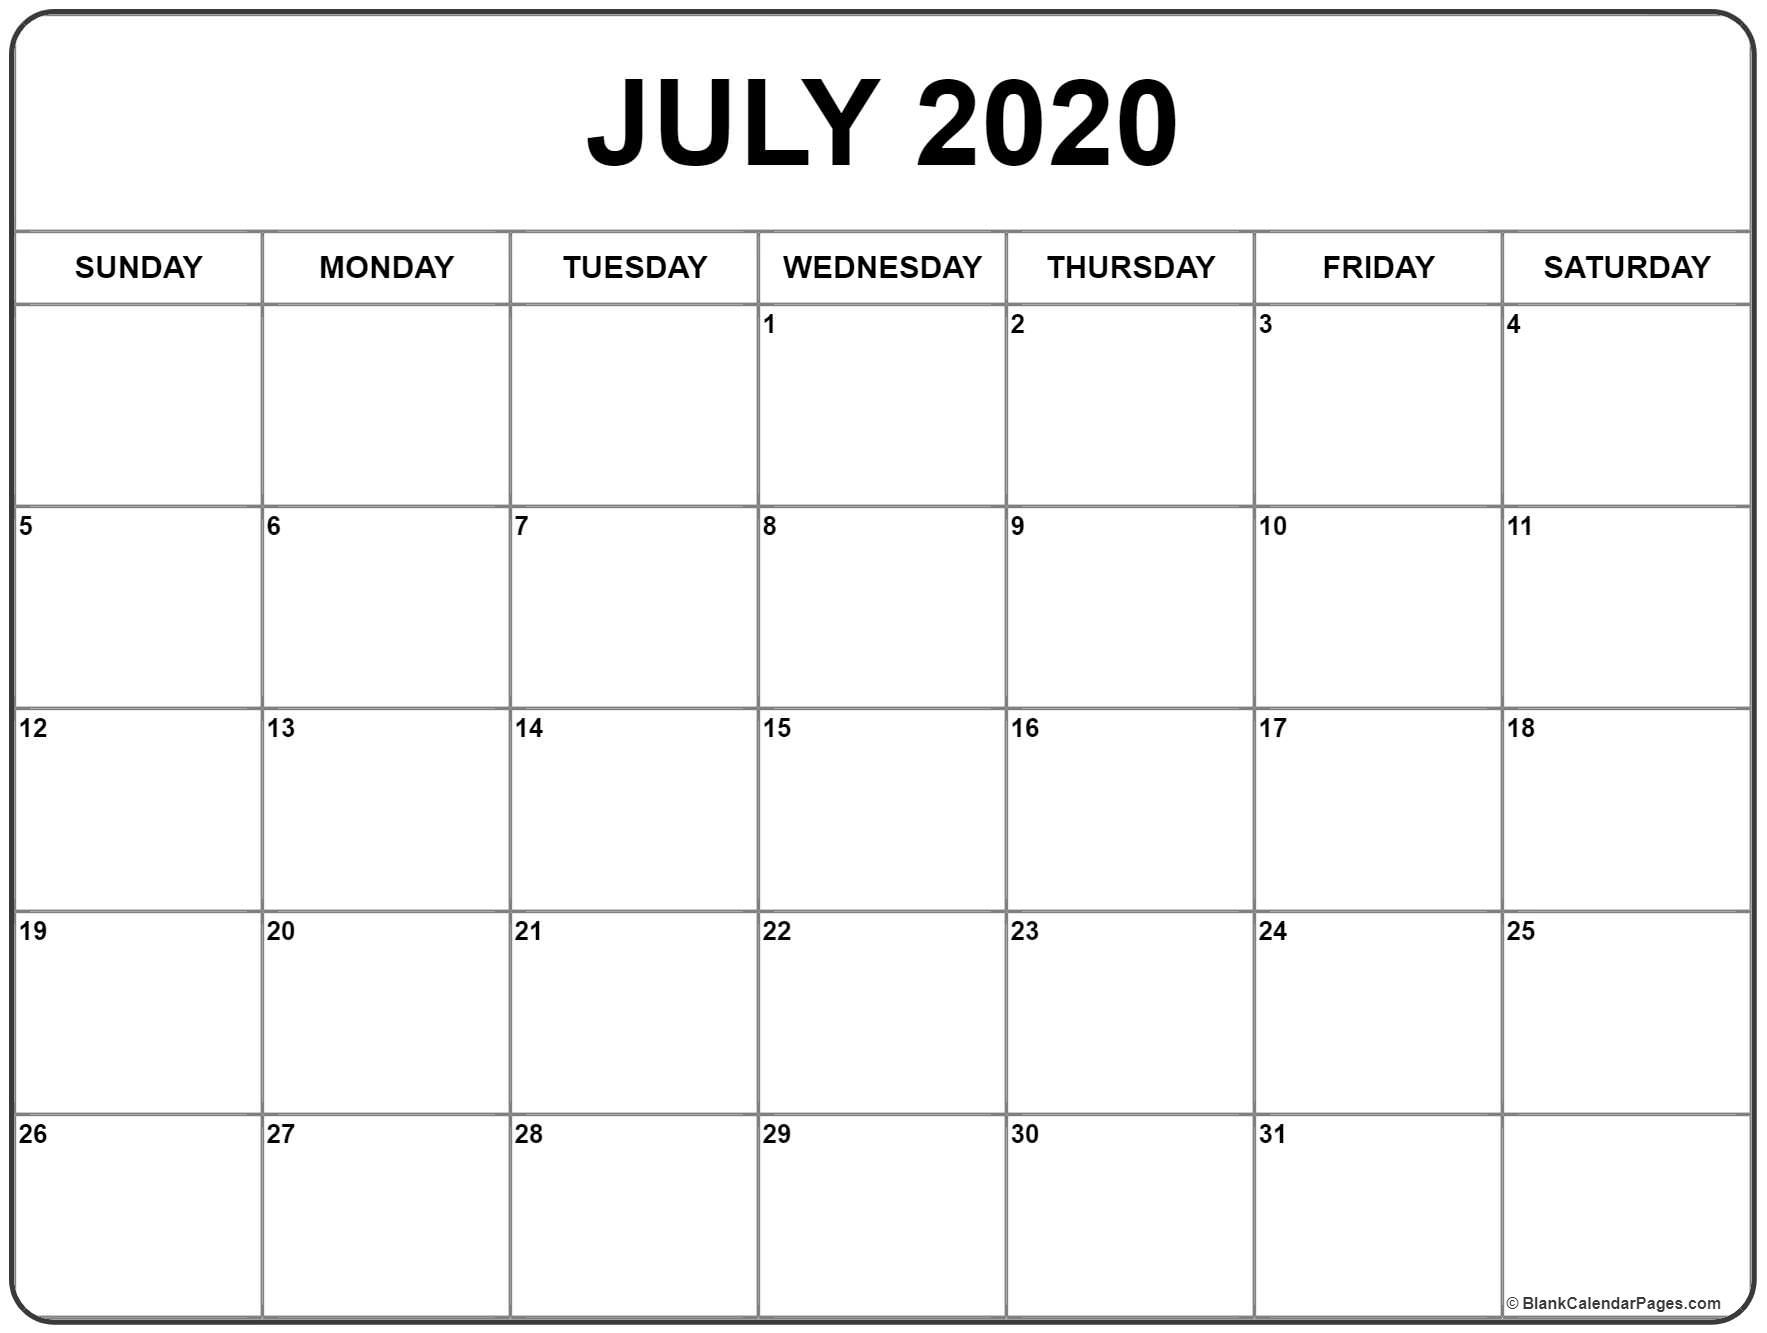 July 2020 Calendar   Printable Calendars   Printable Blank